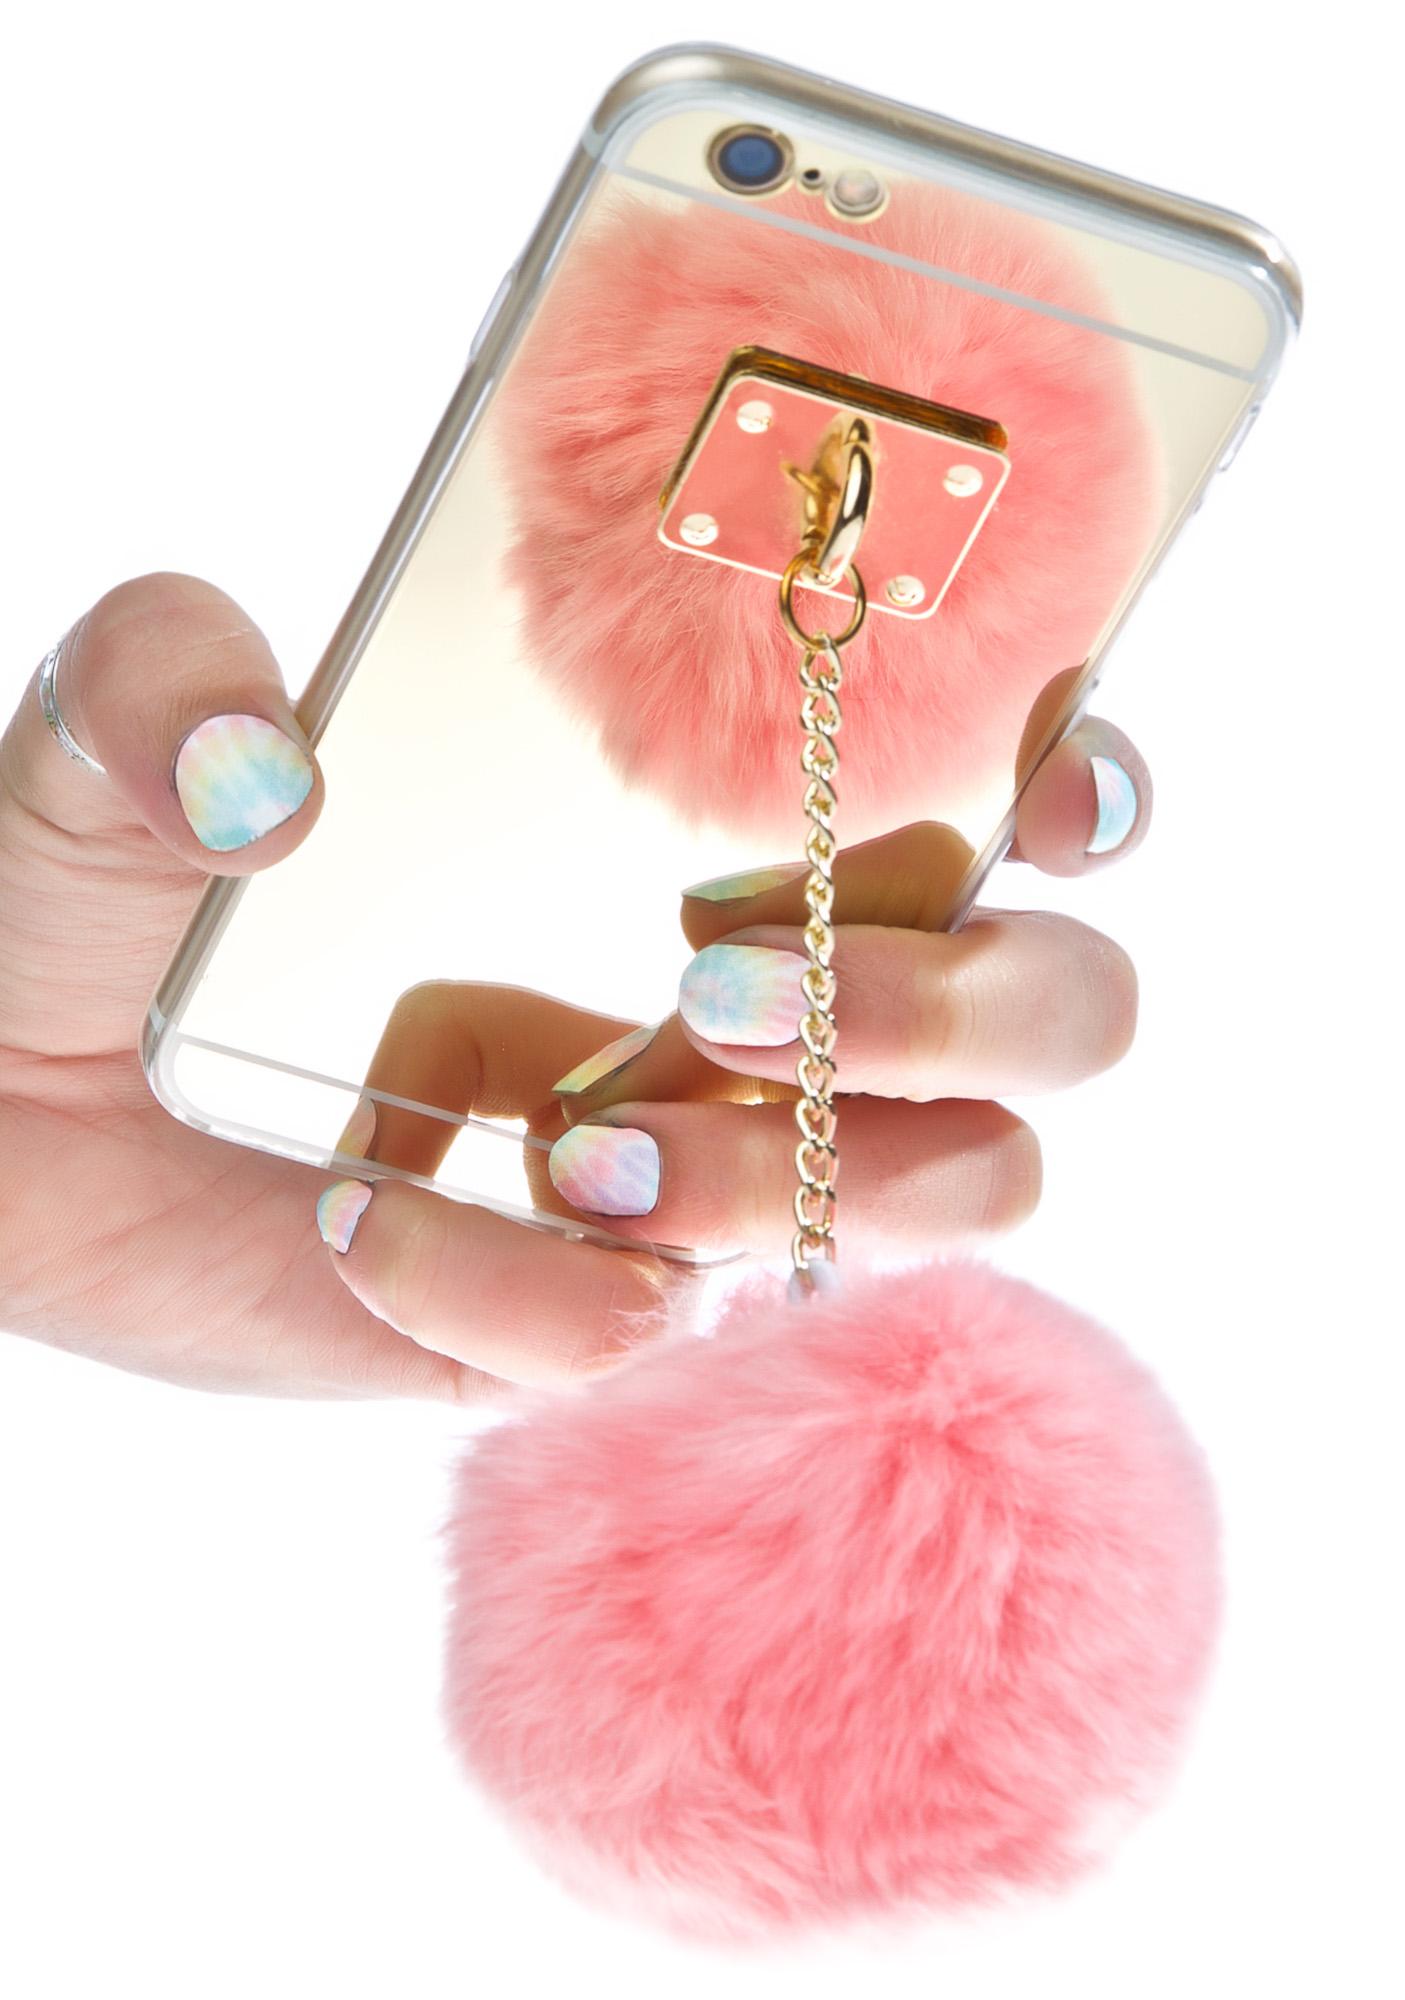 Fur Ball iPhone Case